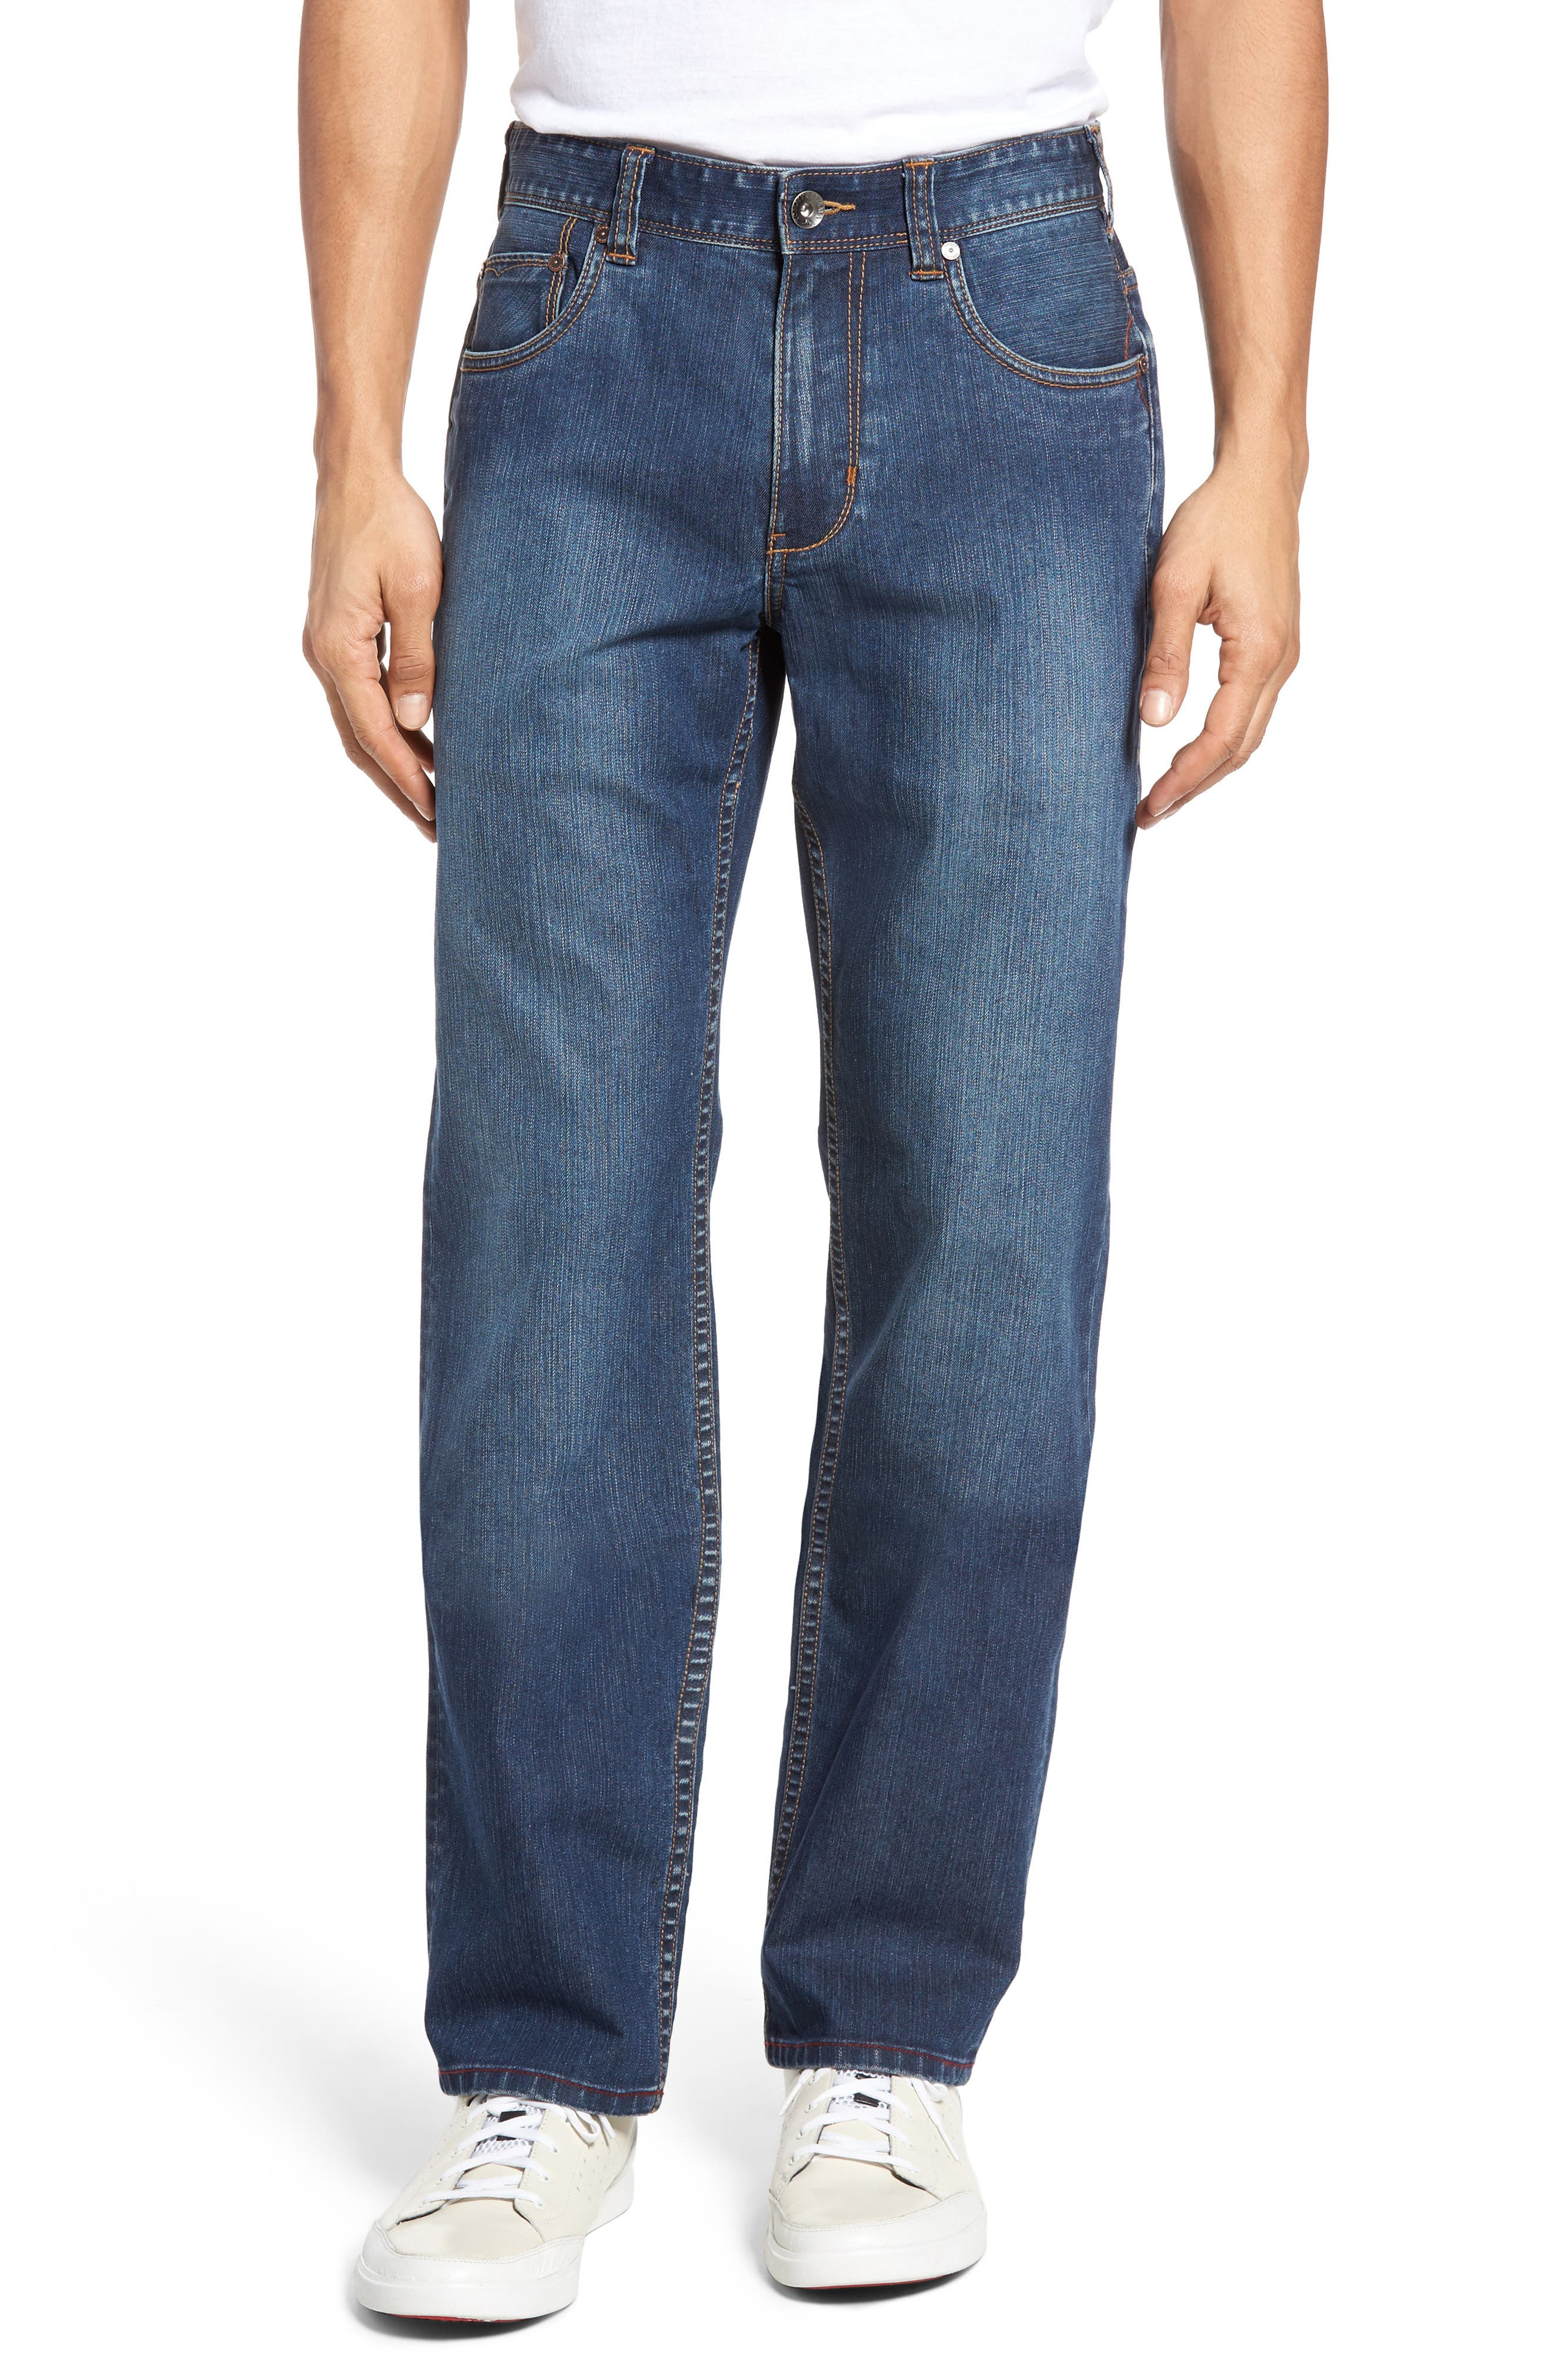 Sorrento Straight Leg Jeans,                         Main,                         color, 400